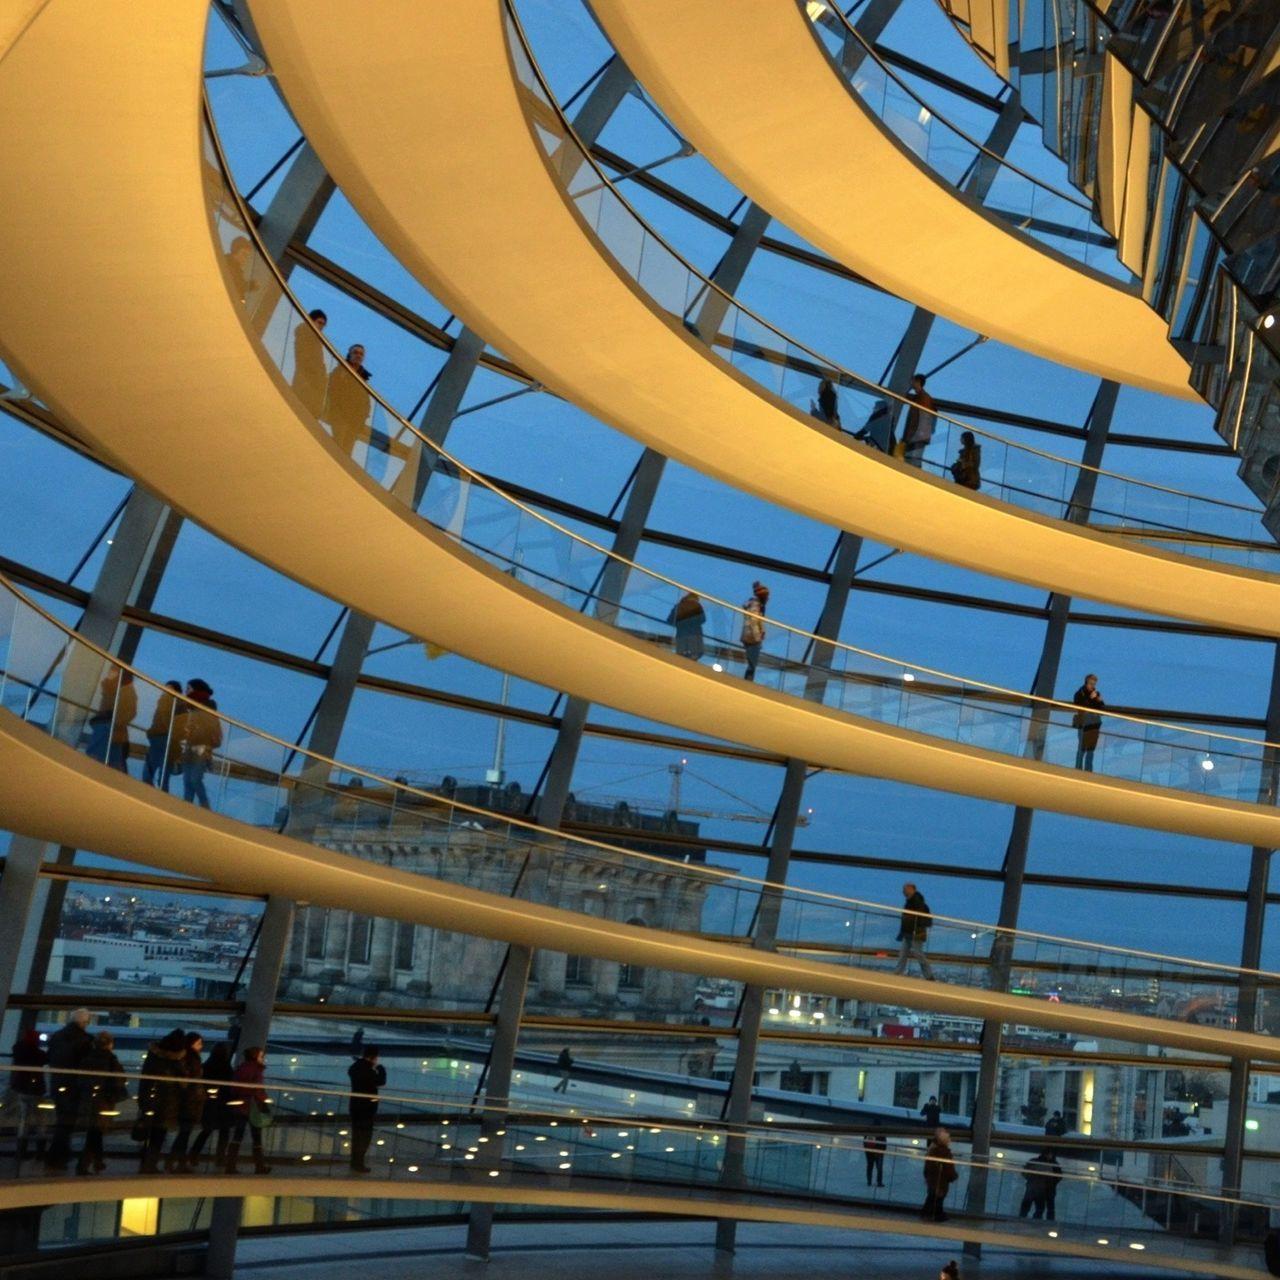 EVA's YELLOW STRIPES!!! EyeEm Best Edits WeAreJuxt.com AMPt_community Around The World By Lufthansa